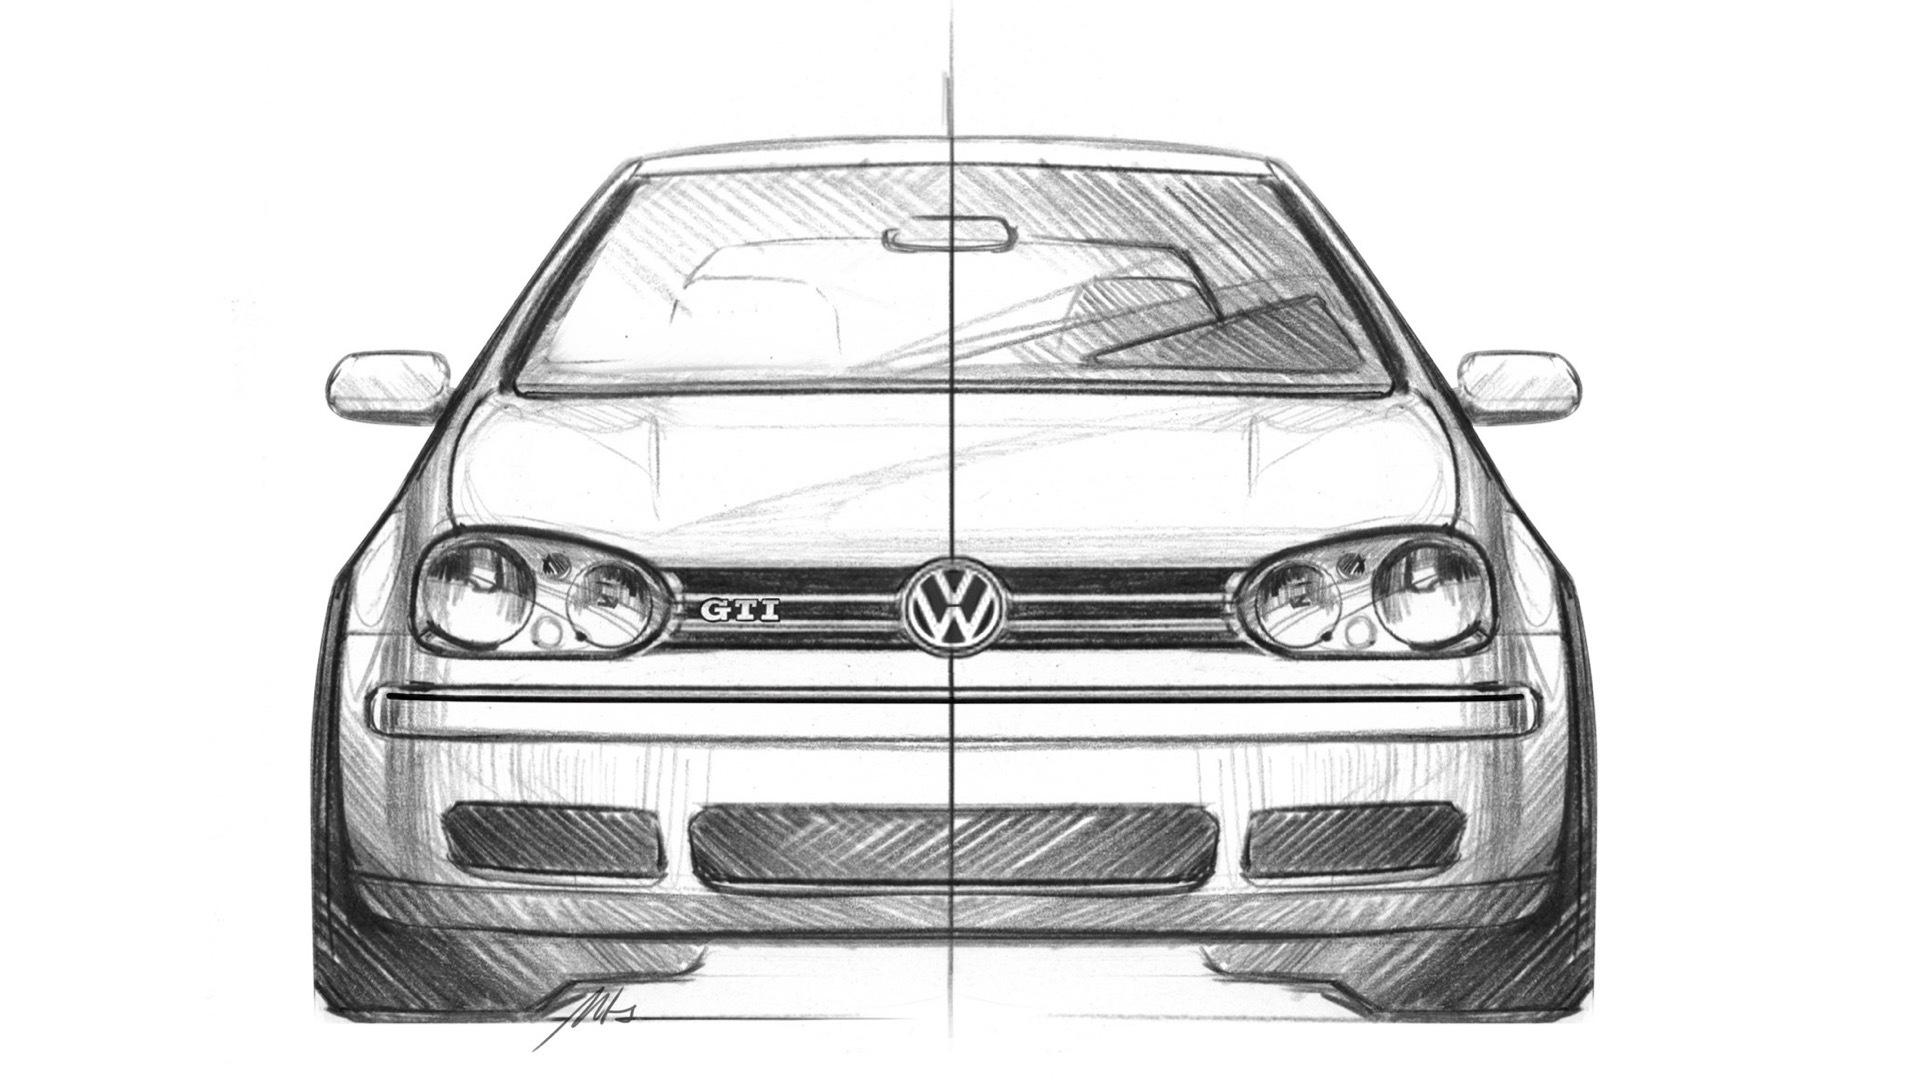 Volkswagen GTI Mk IV